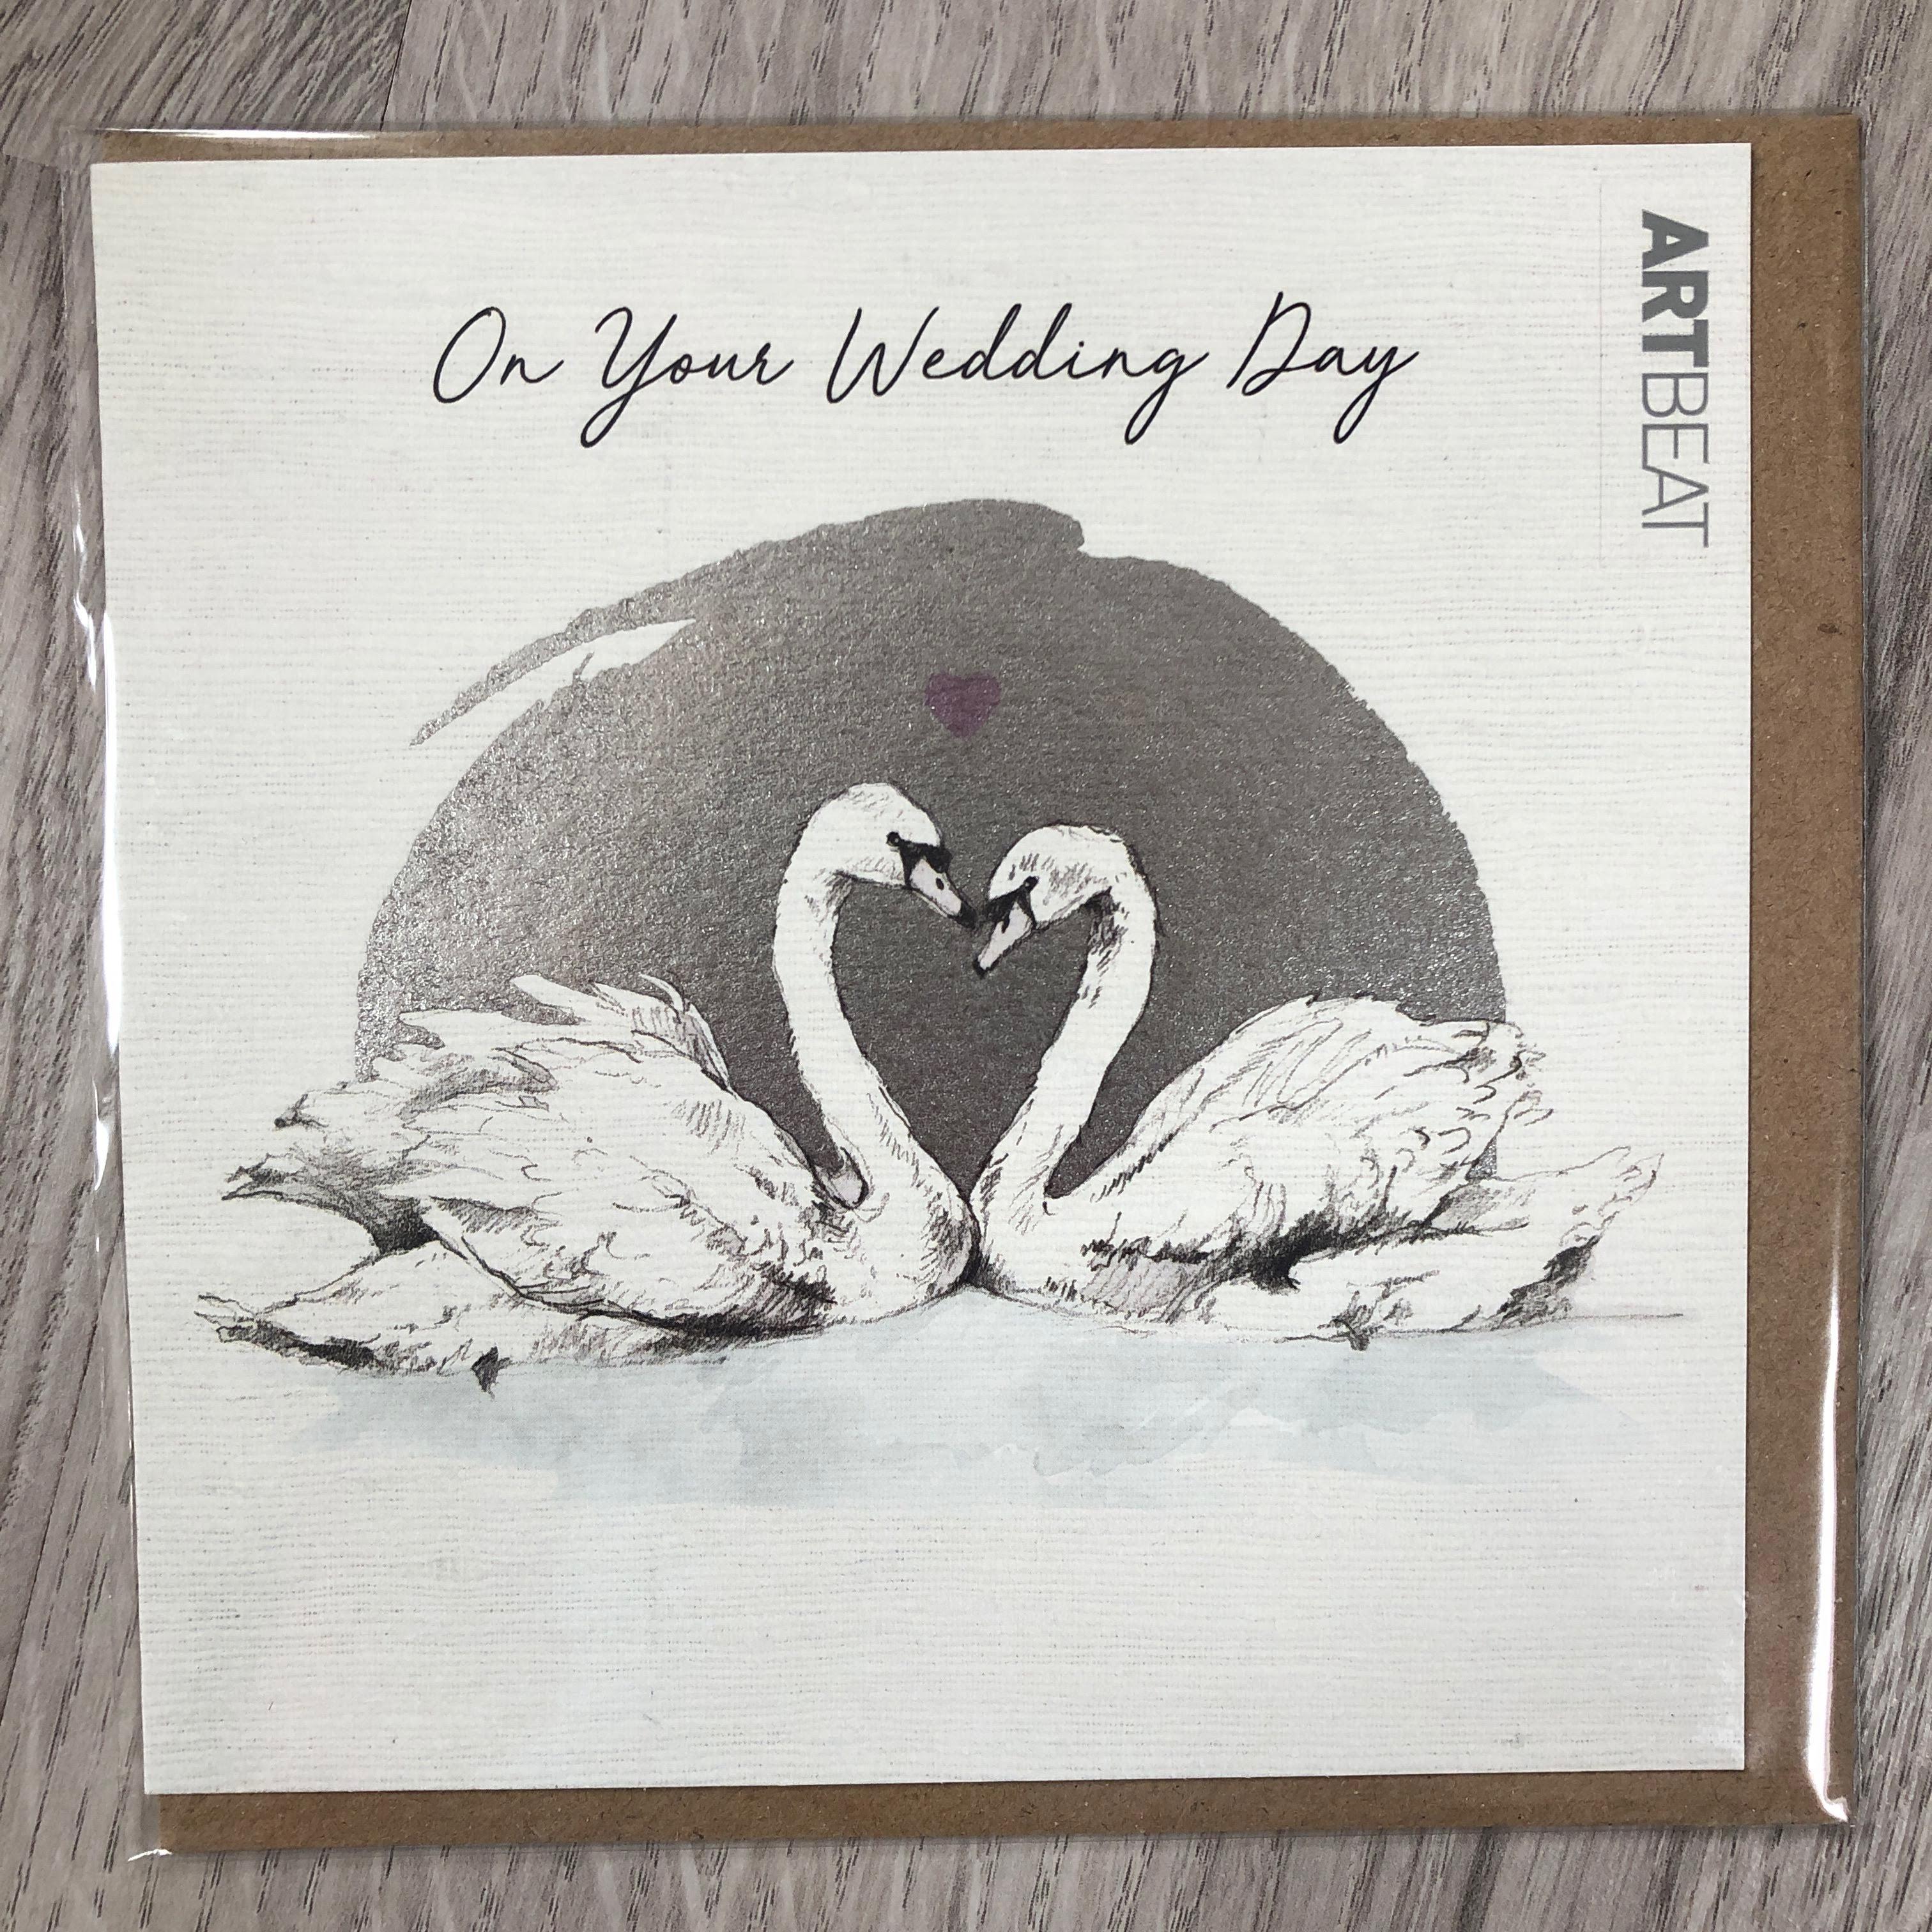 On your wedding day. Love birds